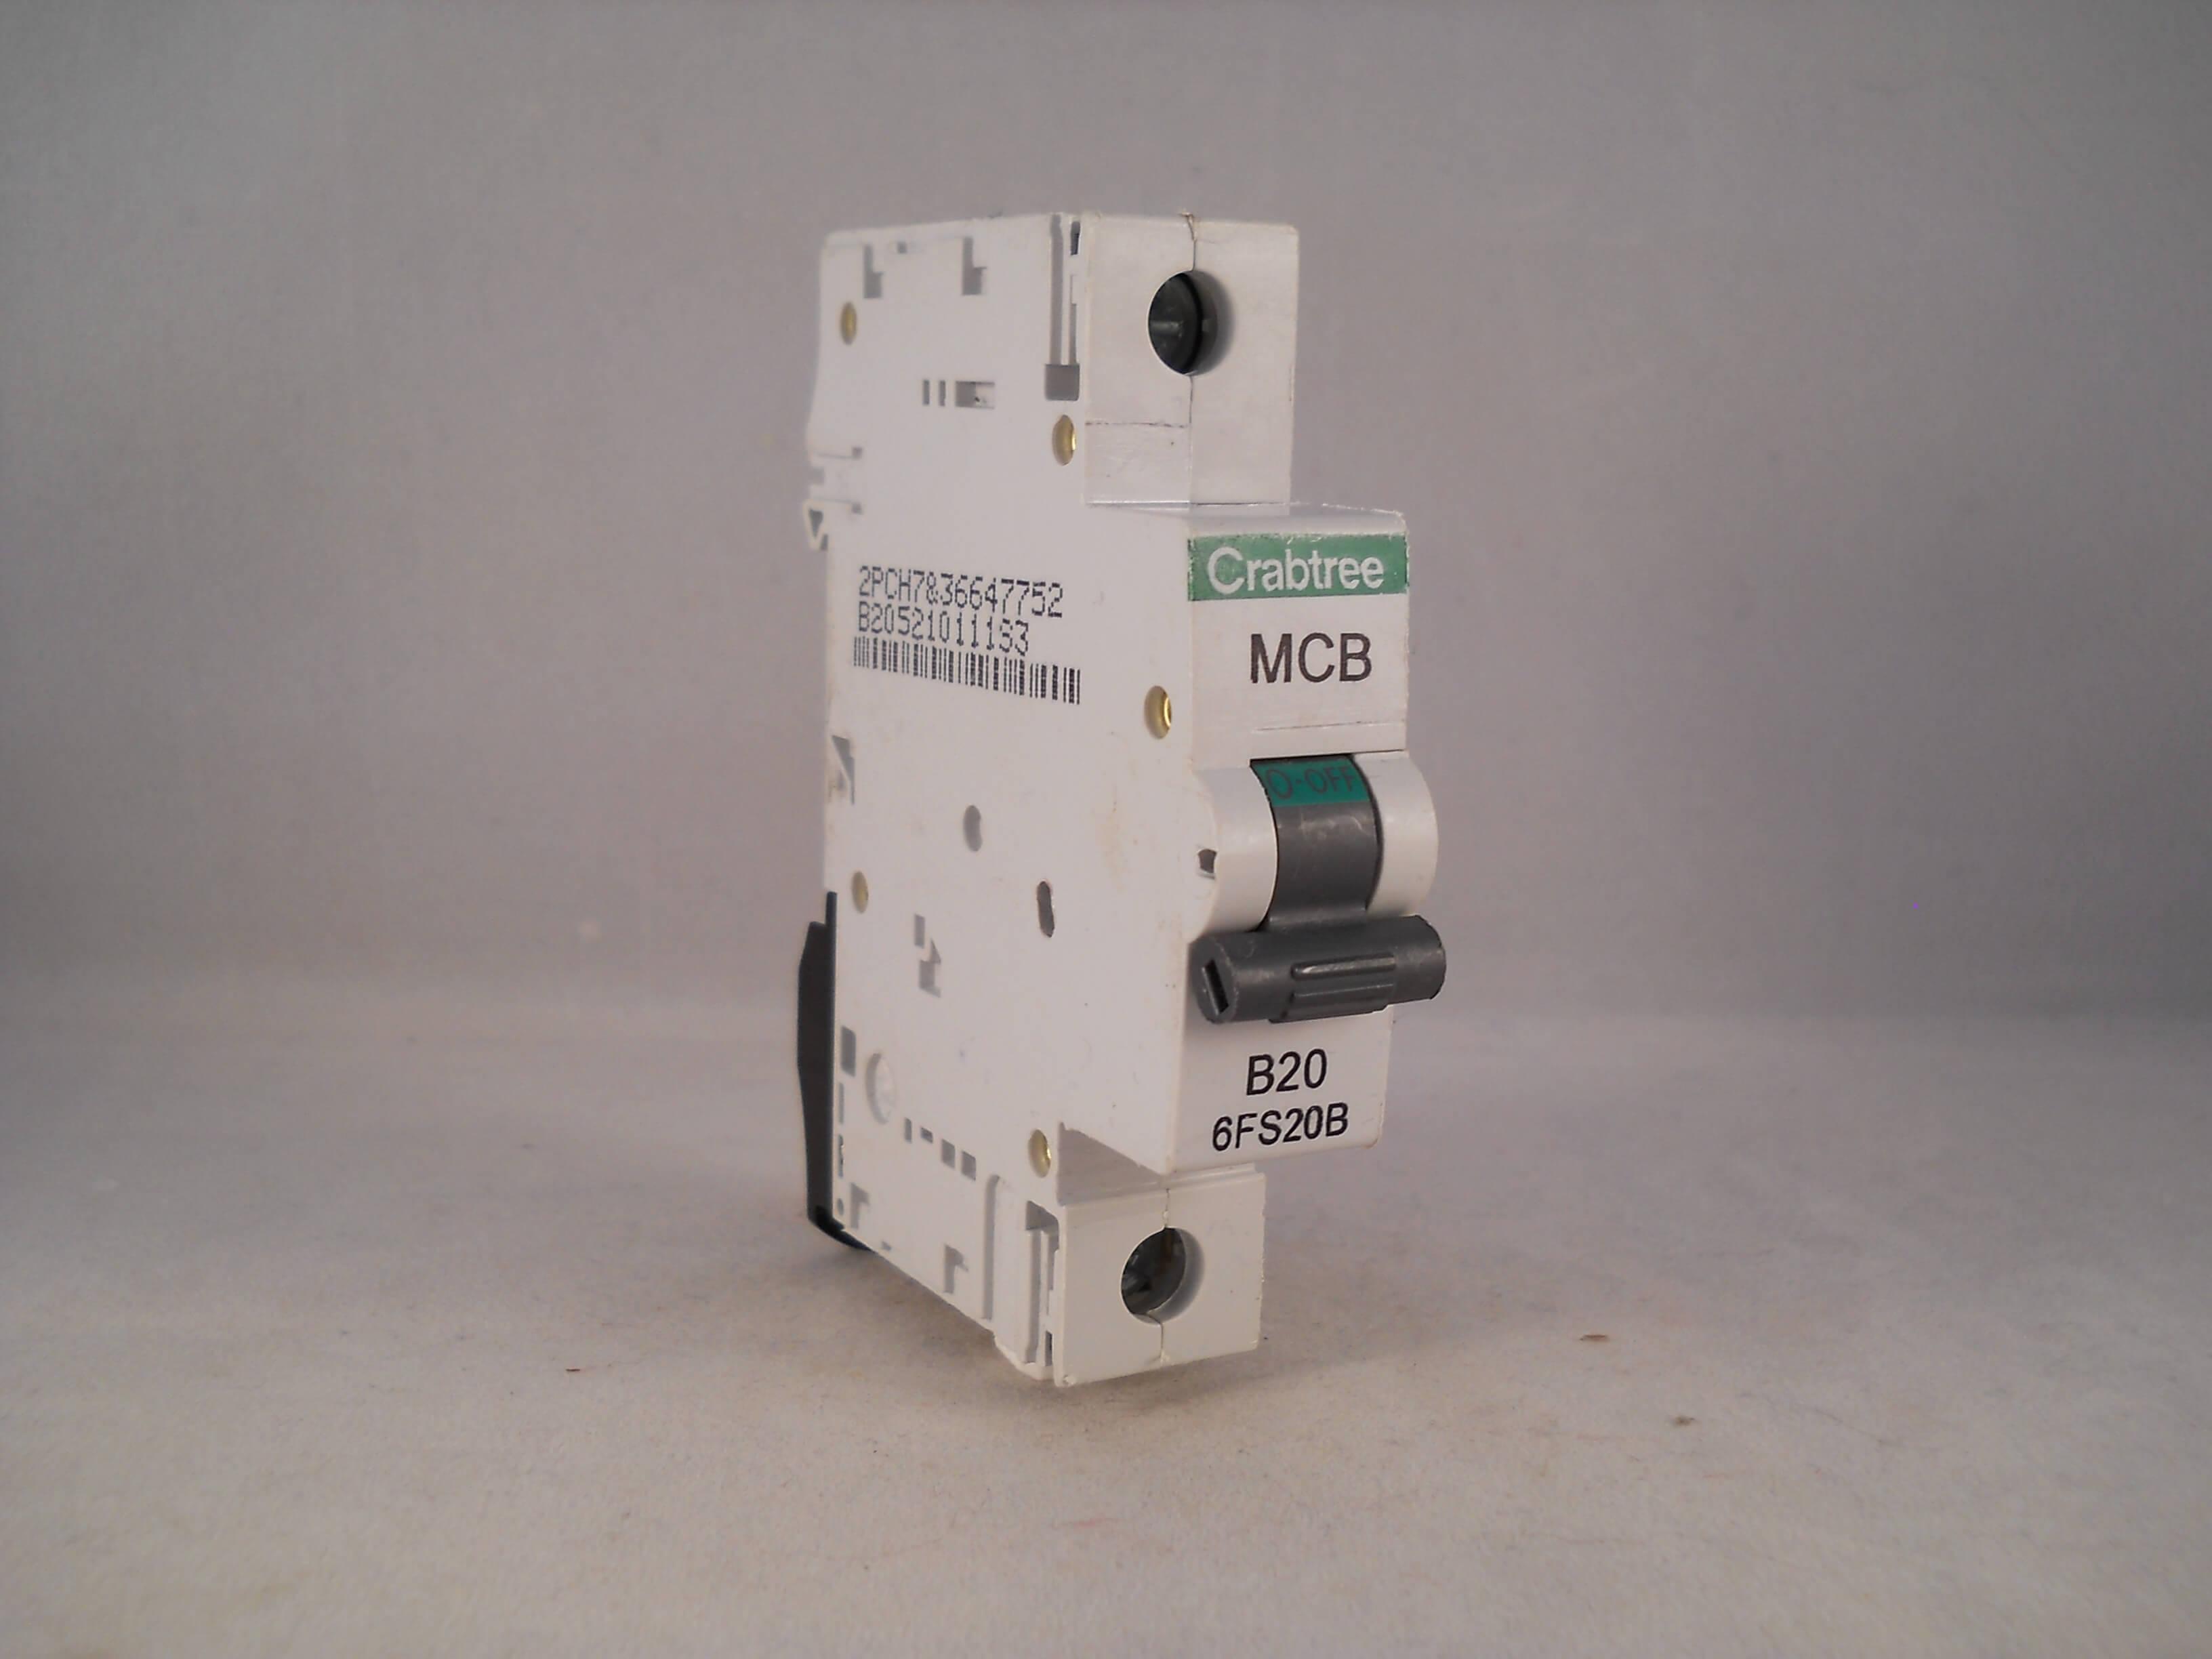 Mcb Circuit Breakers Poles Not Lossing Wiring Diagram Trippedcircuitbreakerpaneljpg Crabtree Loadstar 20 Amp Single Pole Breaker Type B Tripping Curve Miniature